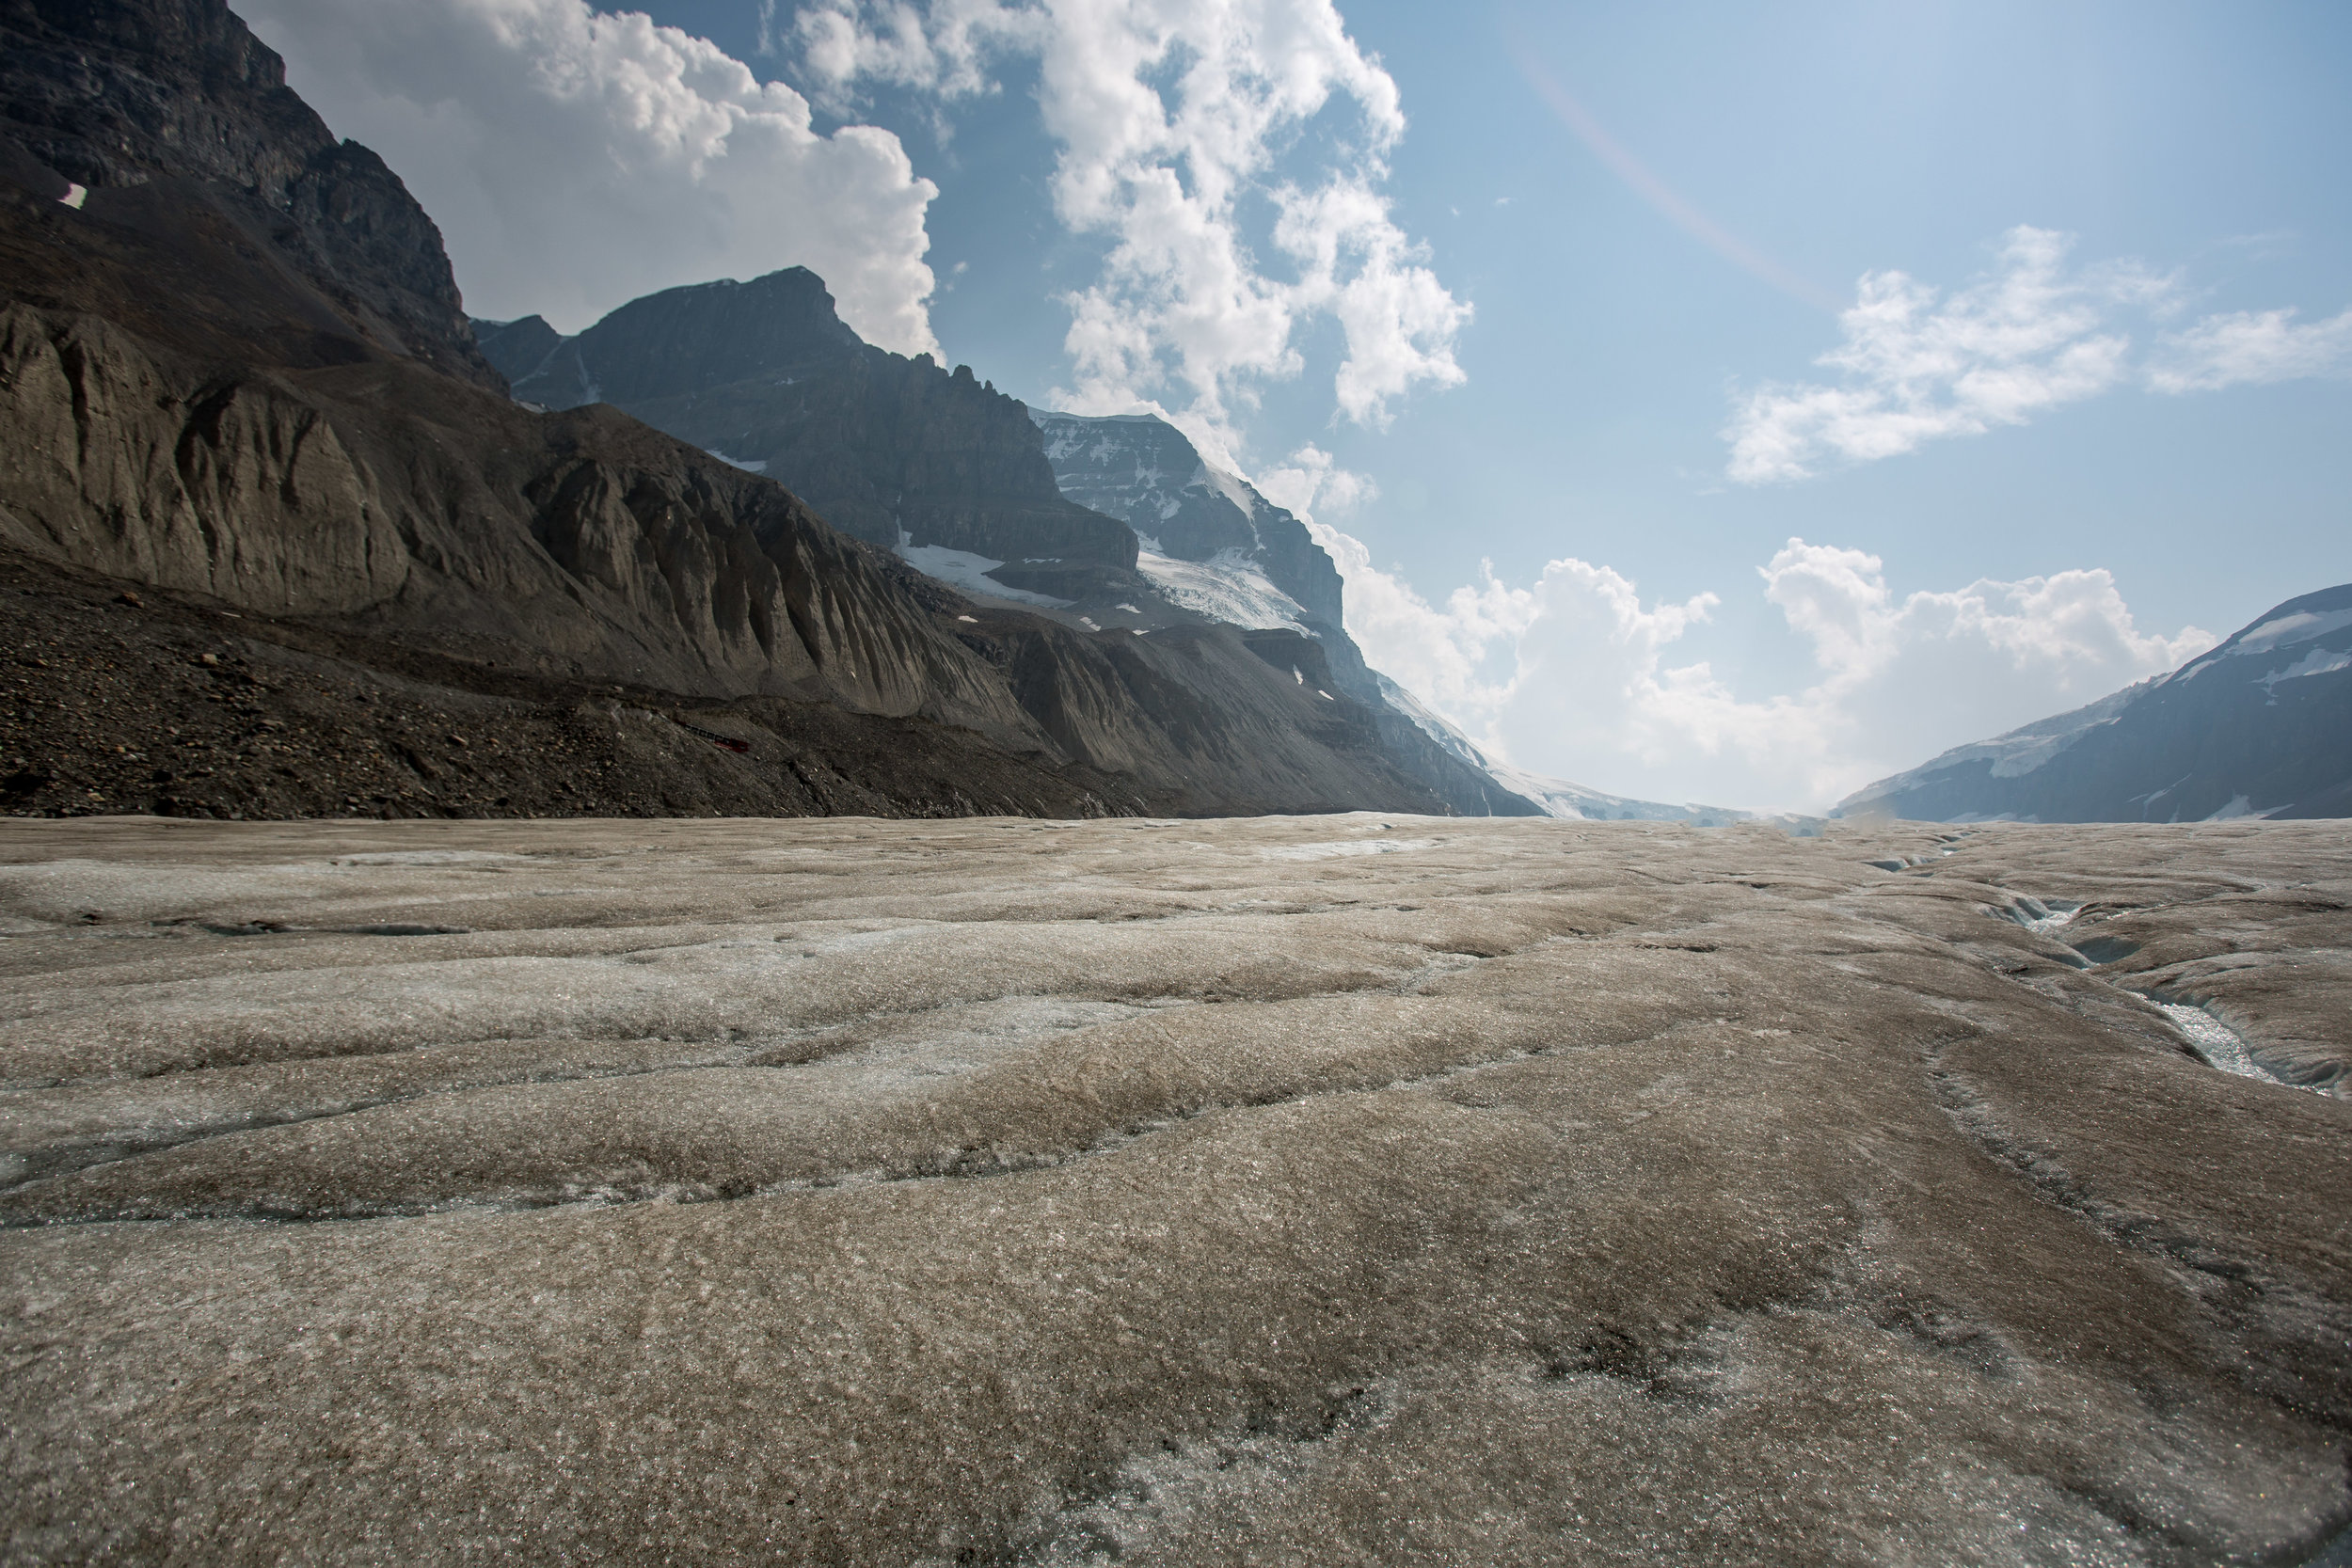 nicole-daacke-photography-banff-national-park-yoho-jasper-canada-parks-alberta-landscape-photographer-canadian-rockies-elopement-photographer-kananaskis-landscape-photos-4975.JPG